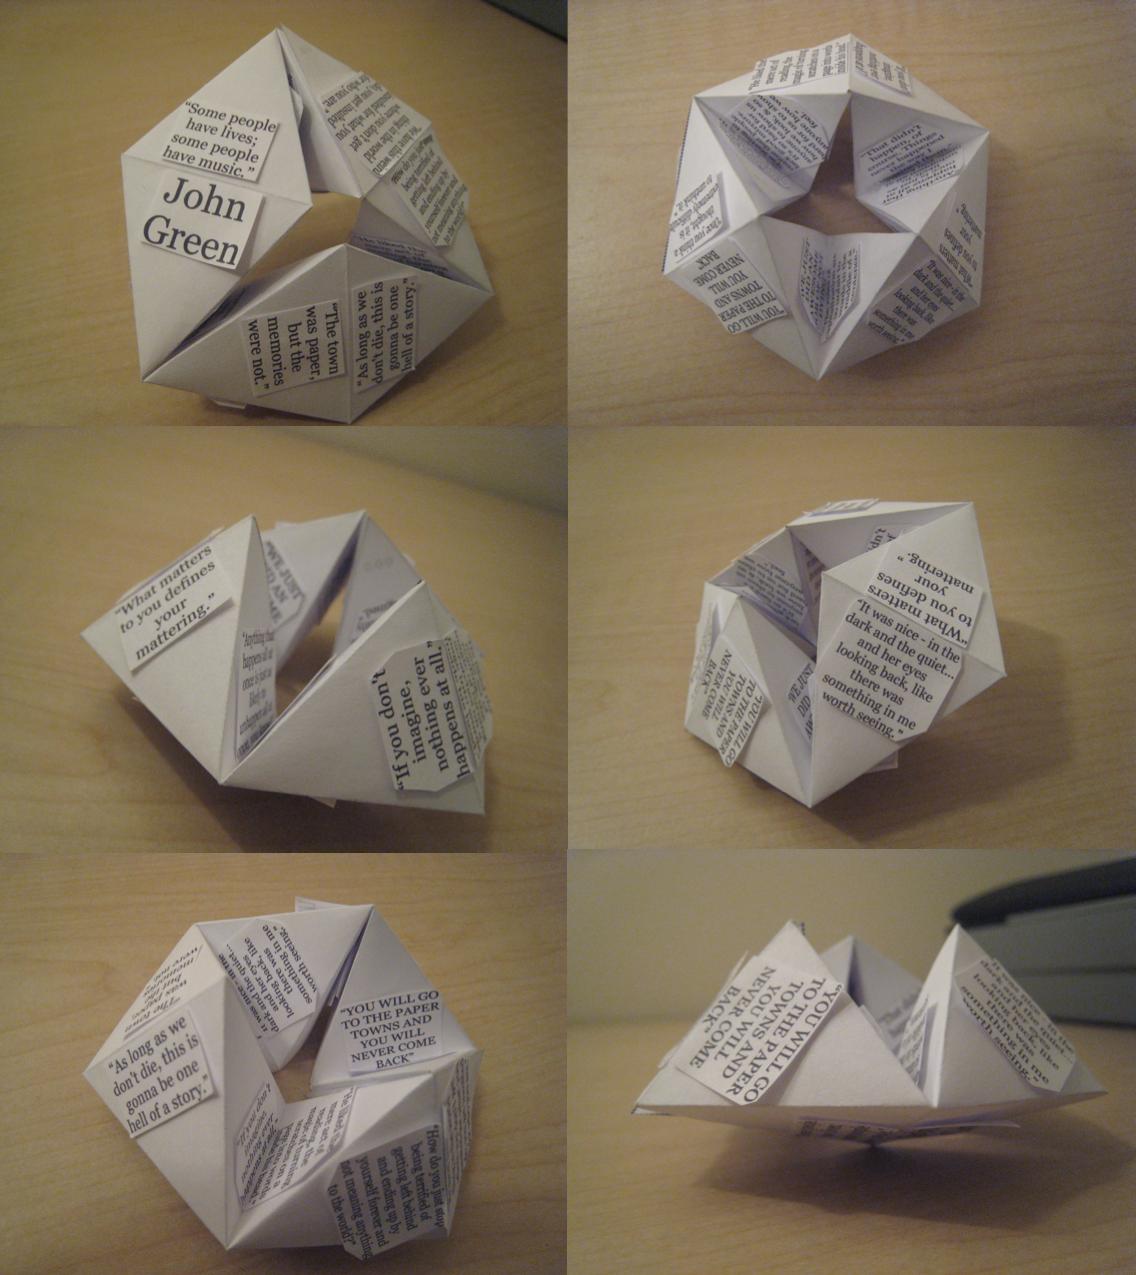 John Green Quote Hexaflexagon 'Card' by CATSAREGREAT on